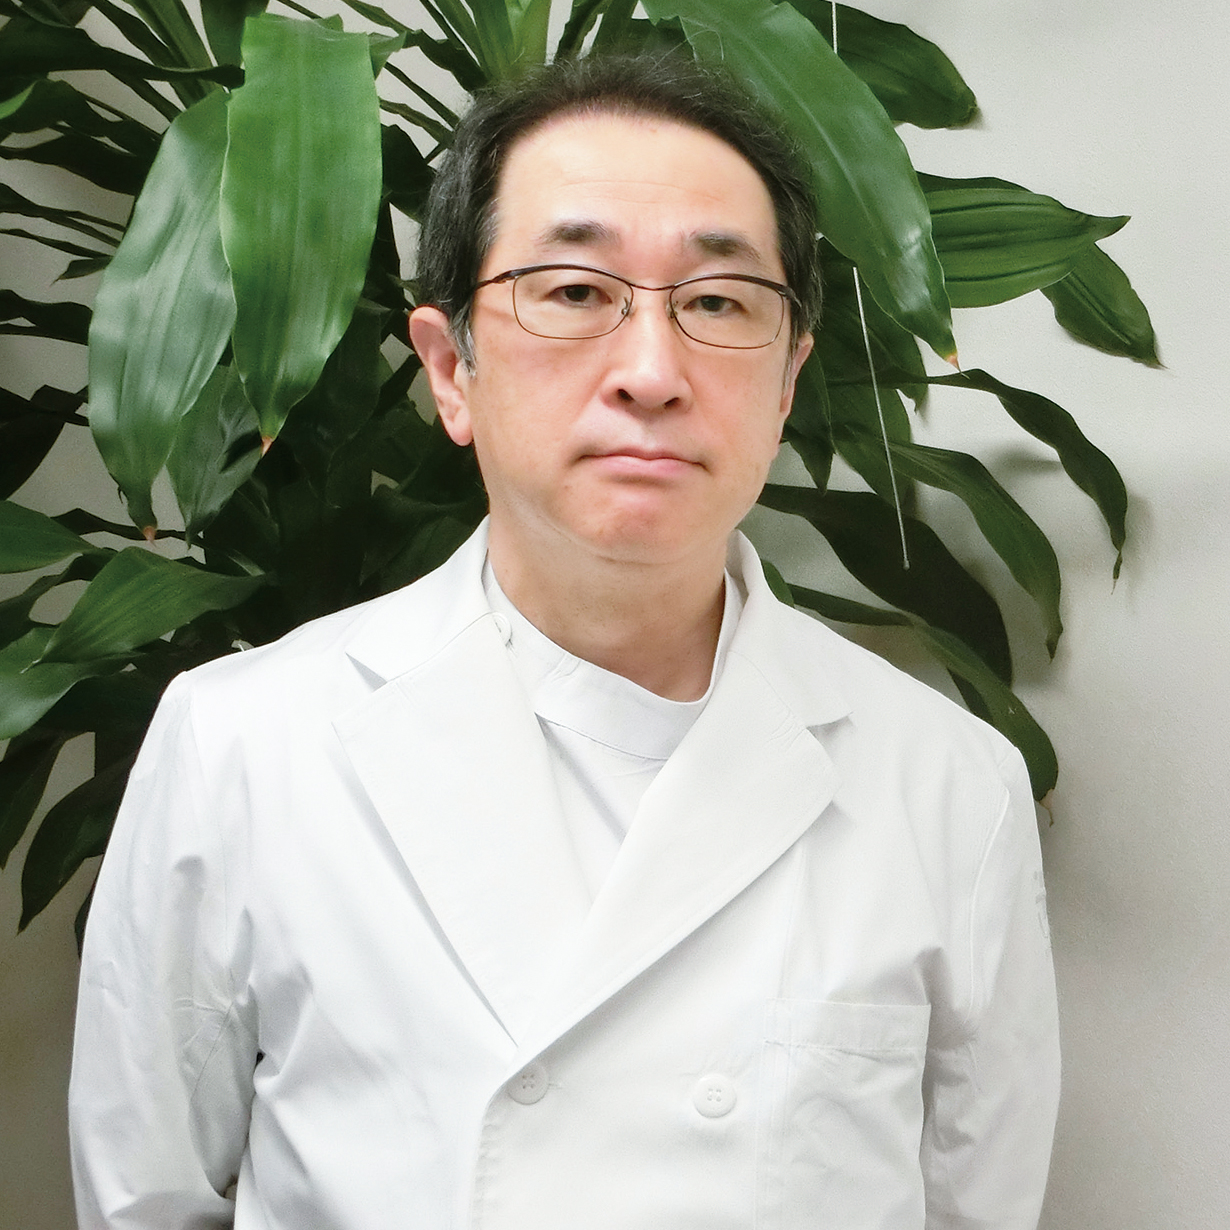 徳島大学大学院医歯薬学研究部 神経外科学分野 高難度の外科治療を安全に